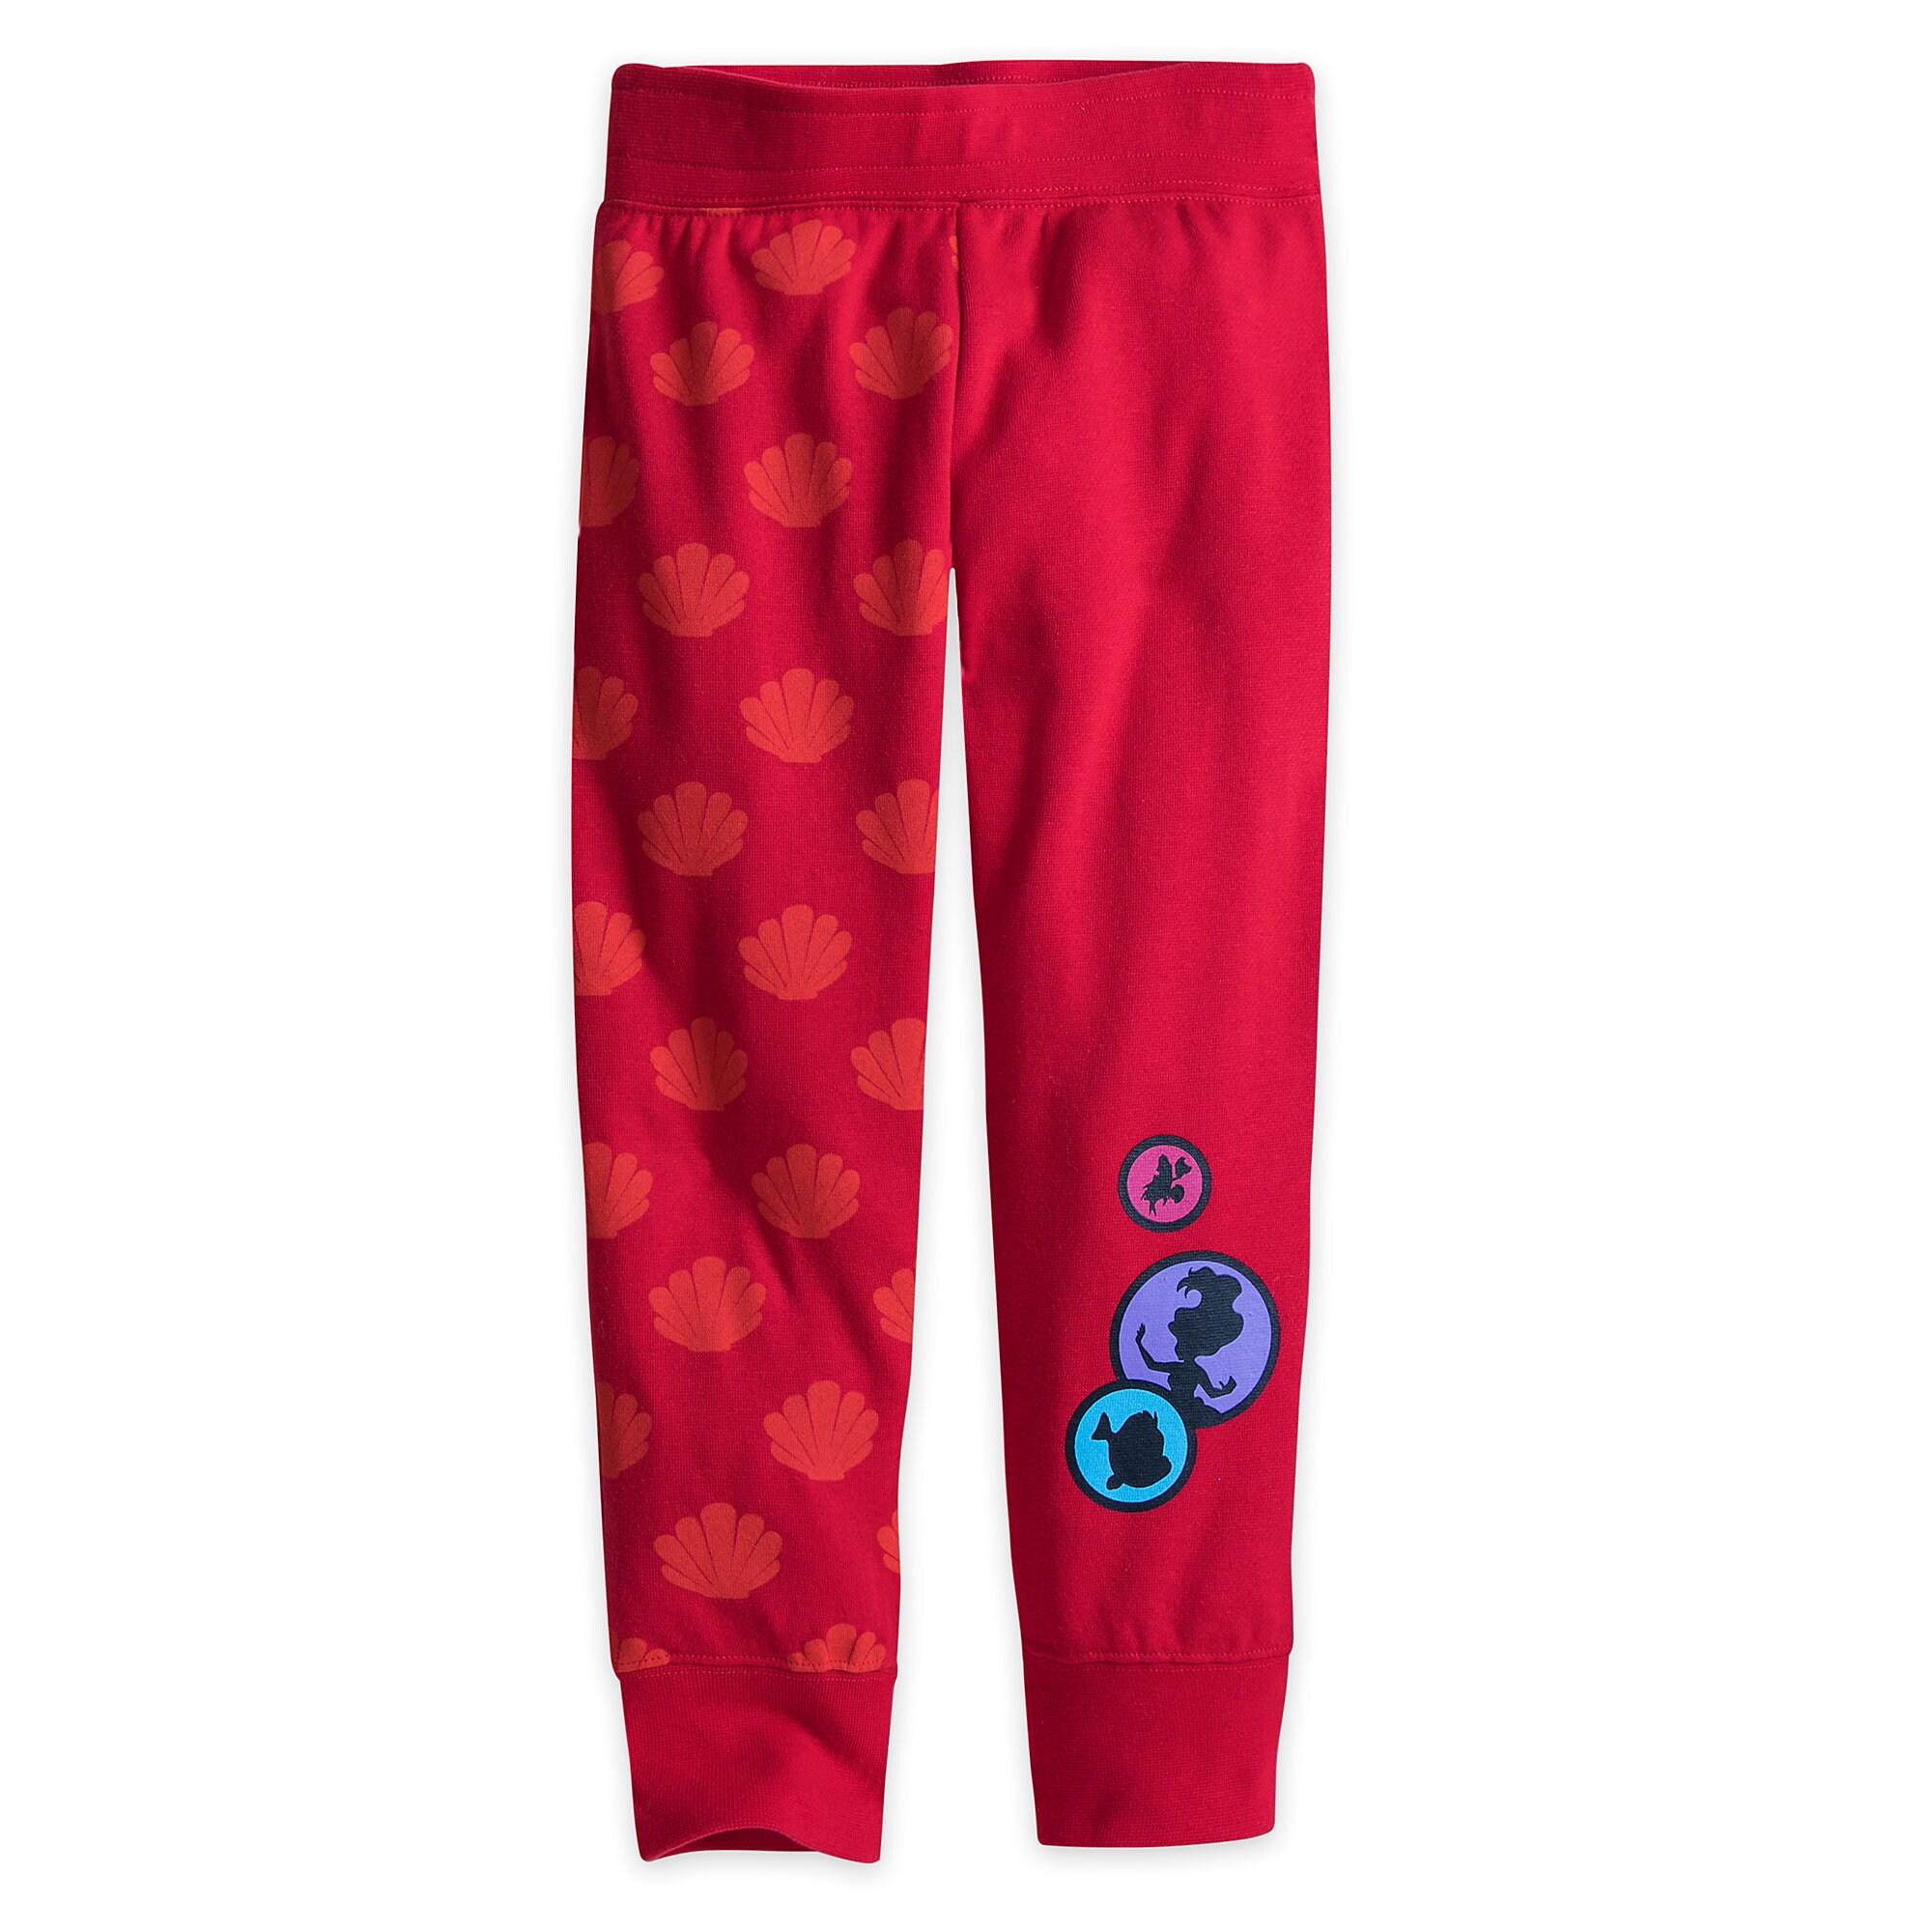 Ariel Fleece Pants for Girls